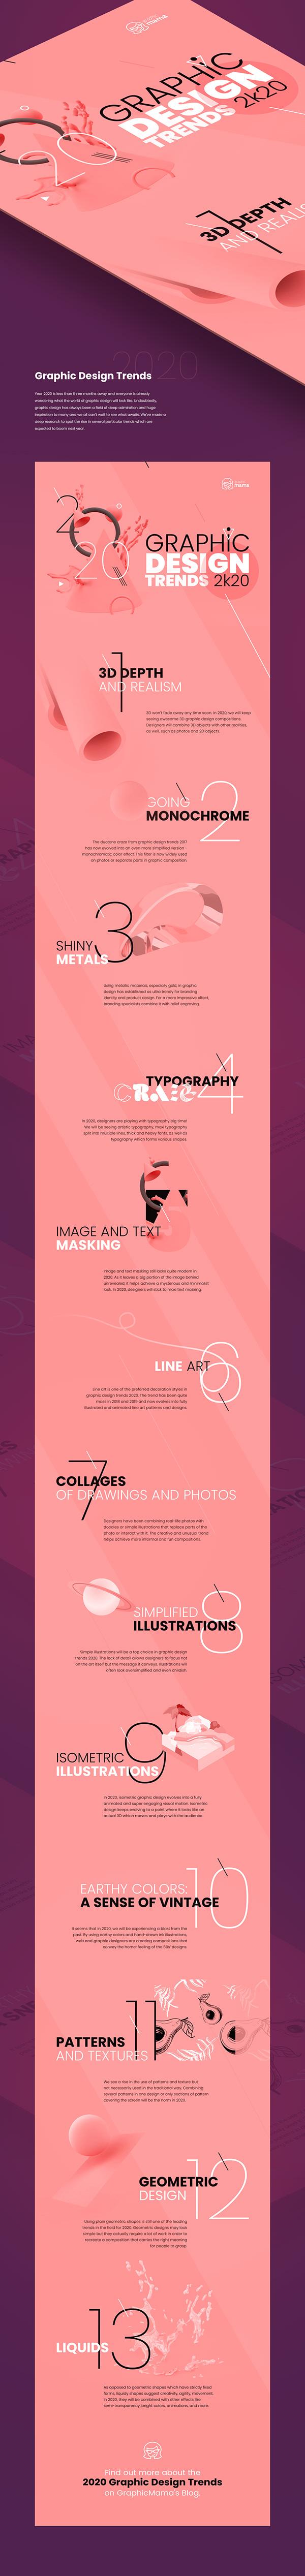 Top Graphic Design Trends 2020